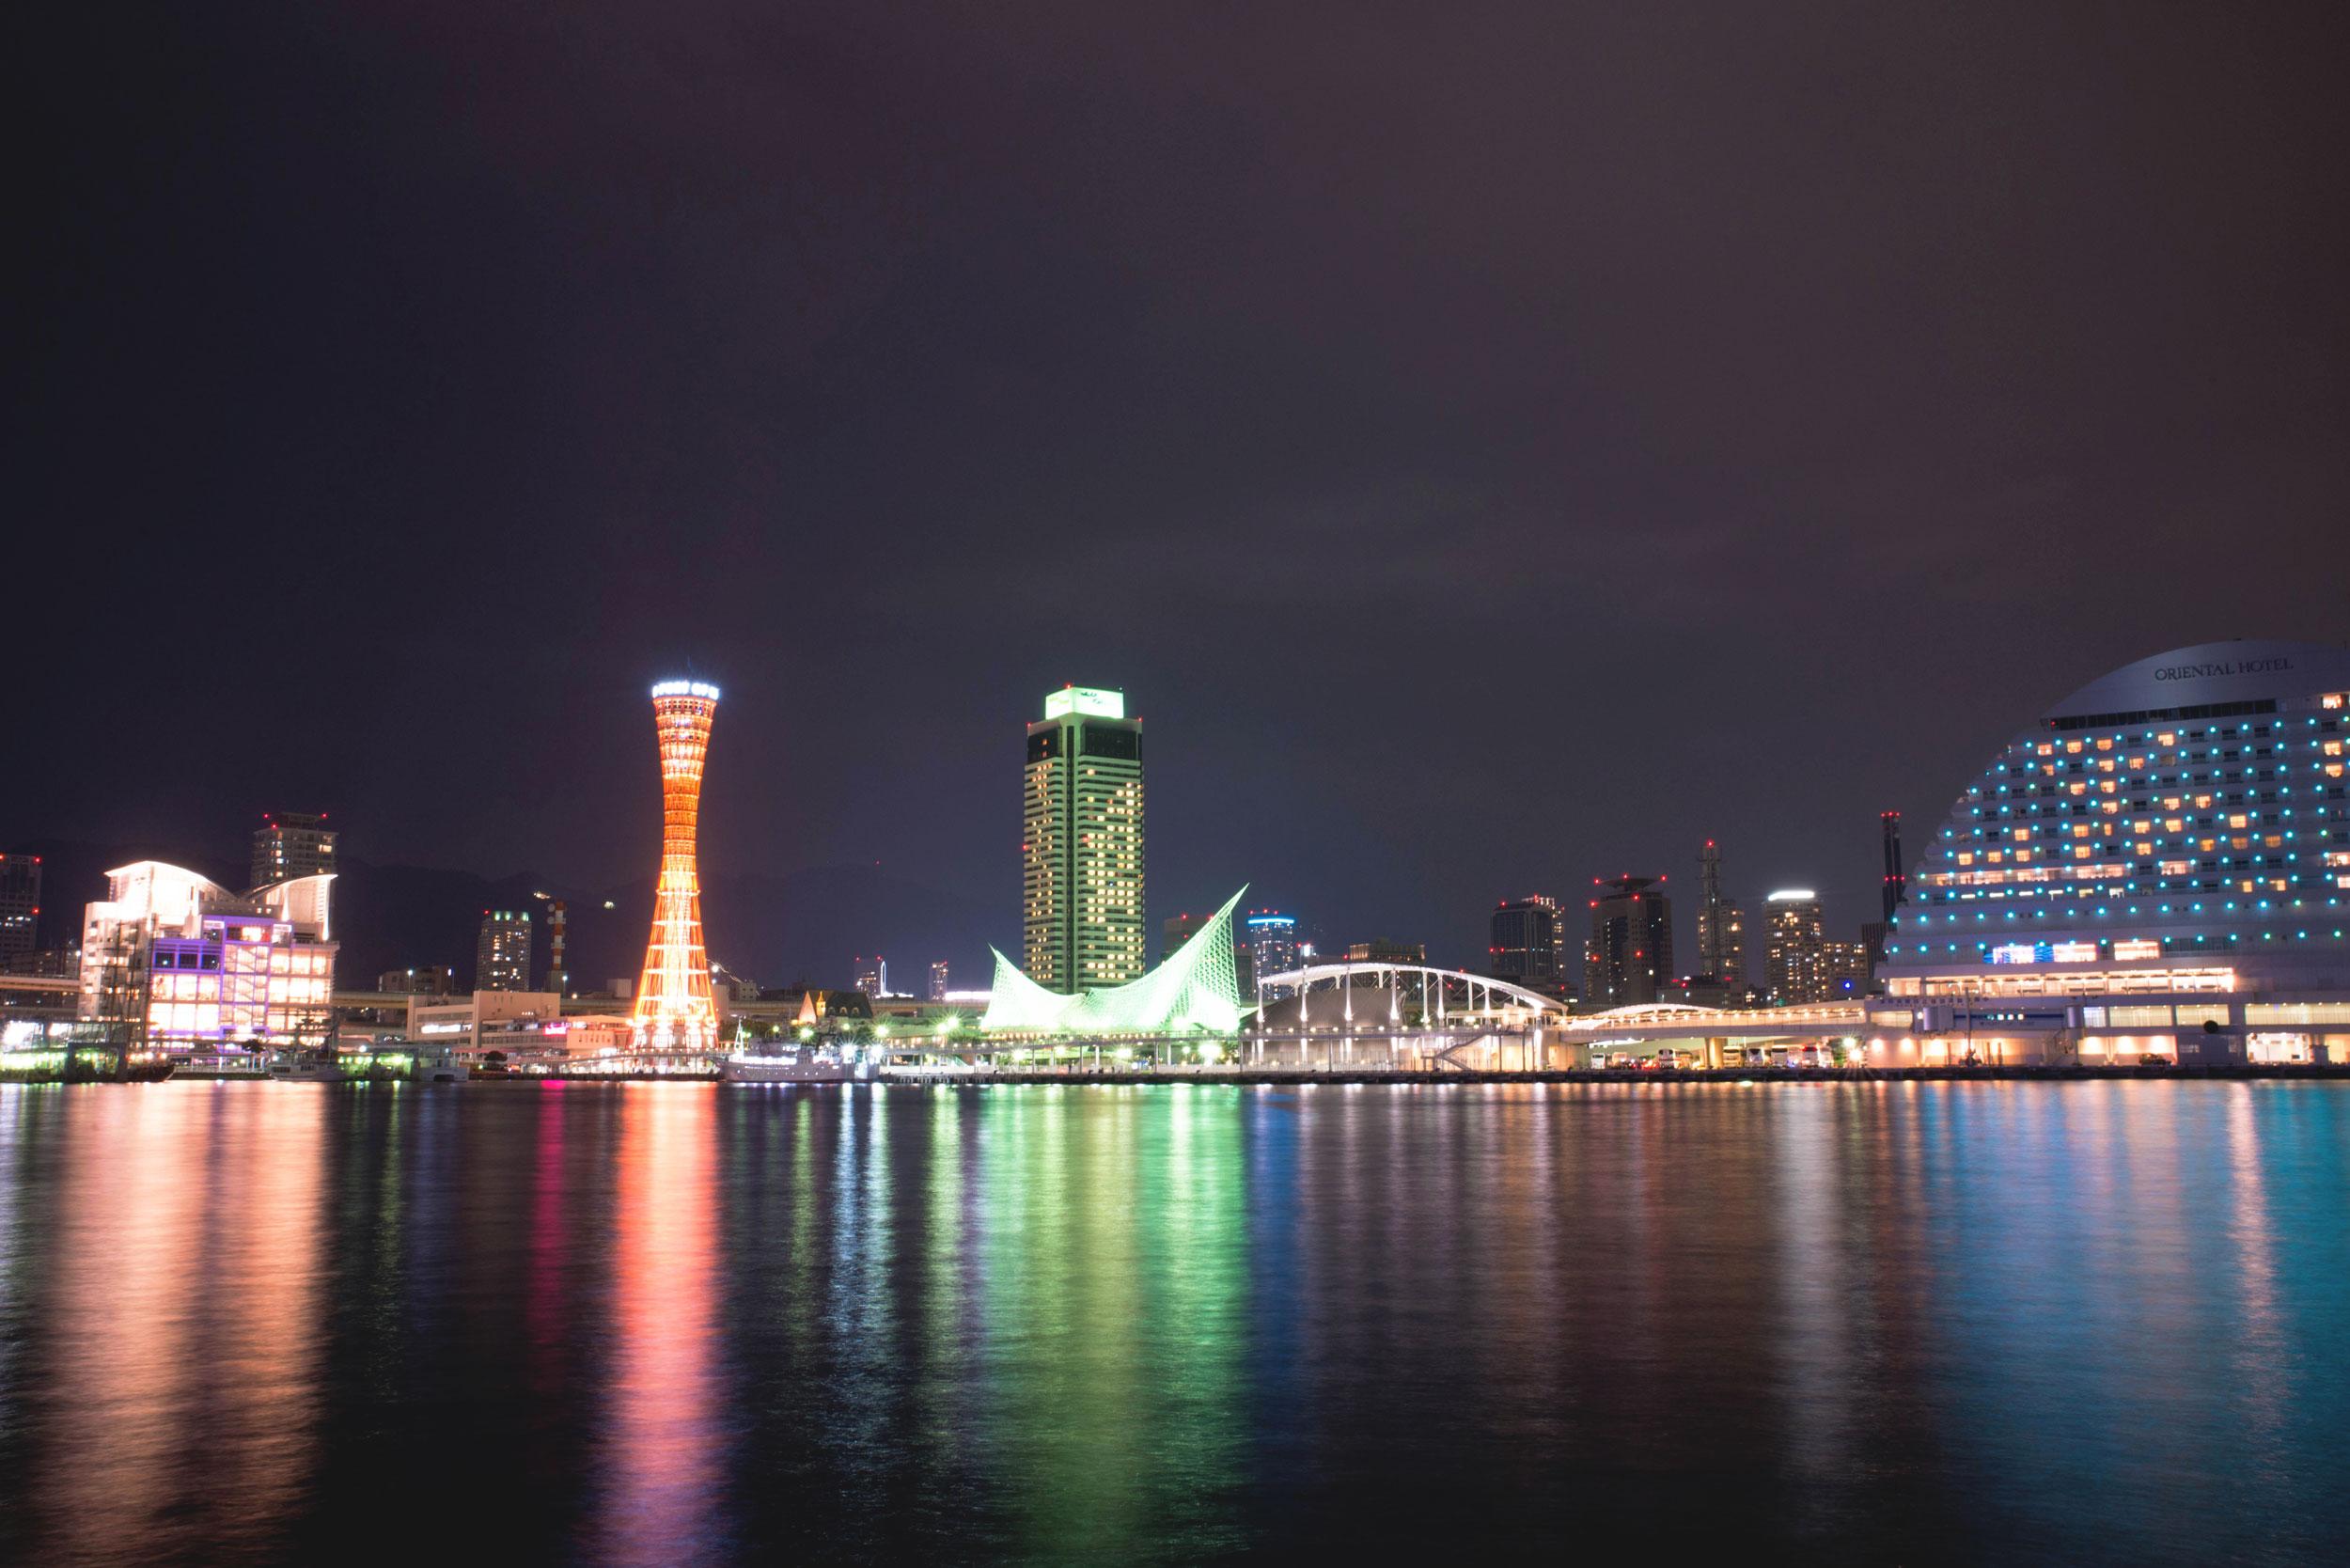 Kobe skyline at night from the port